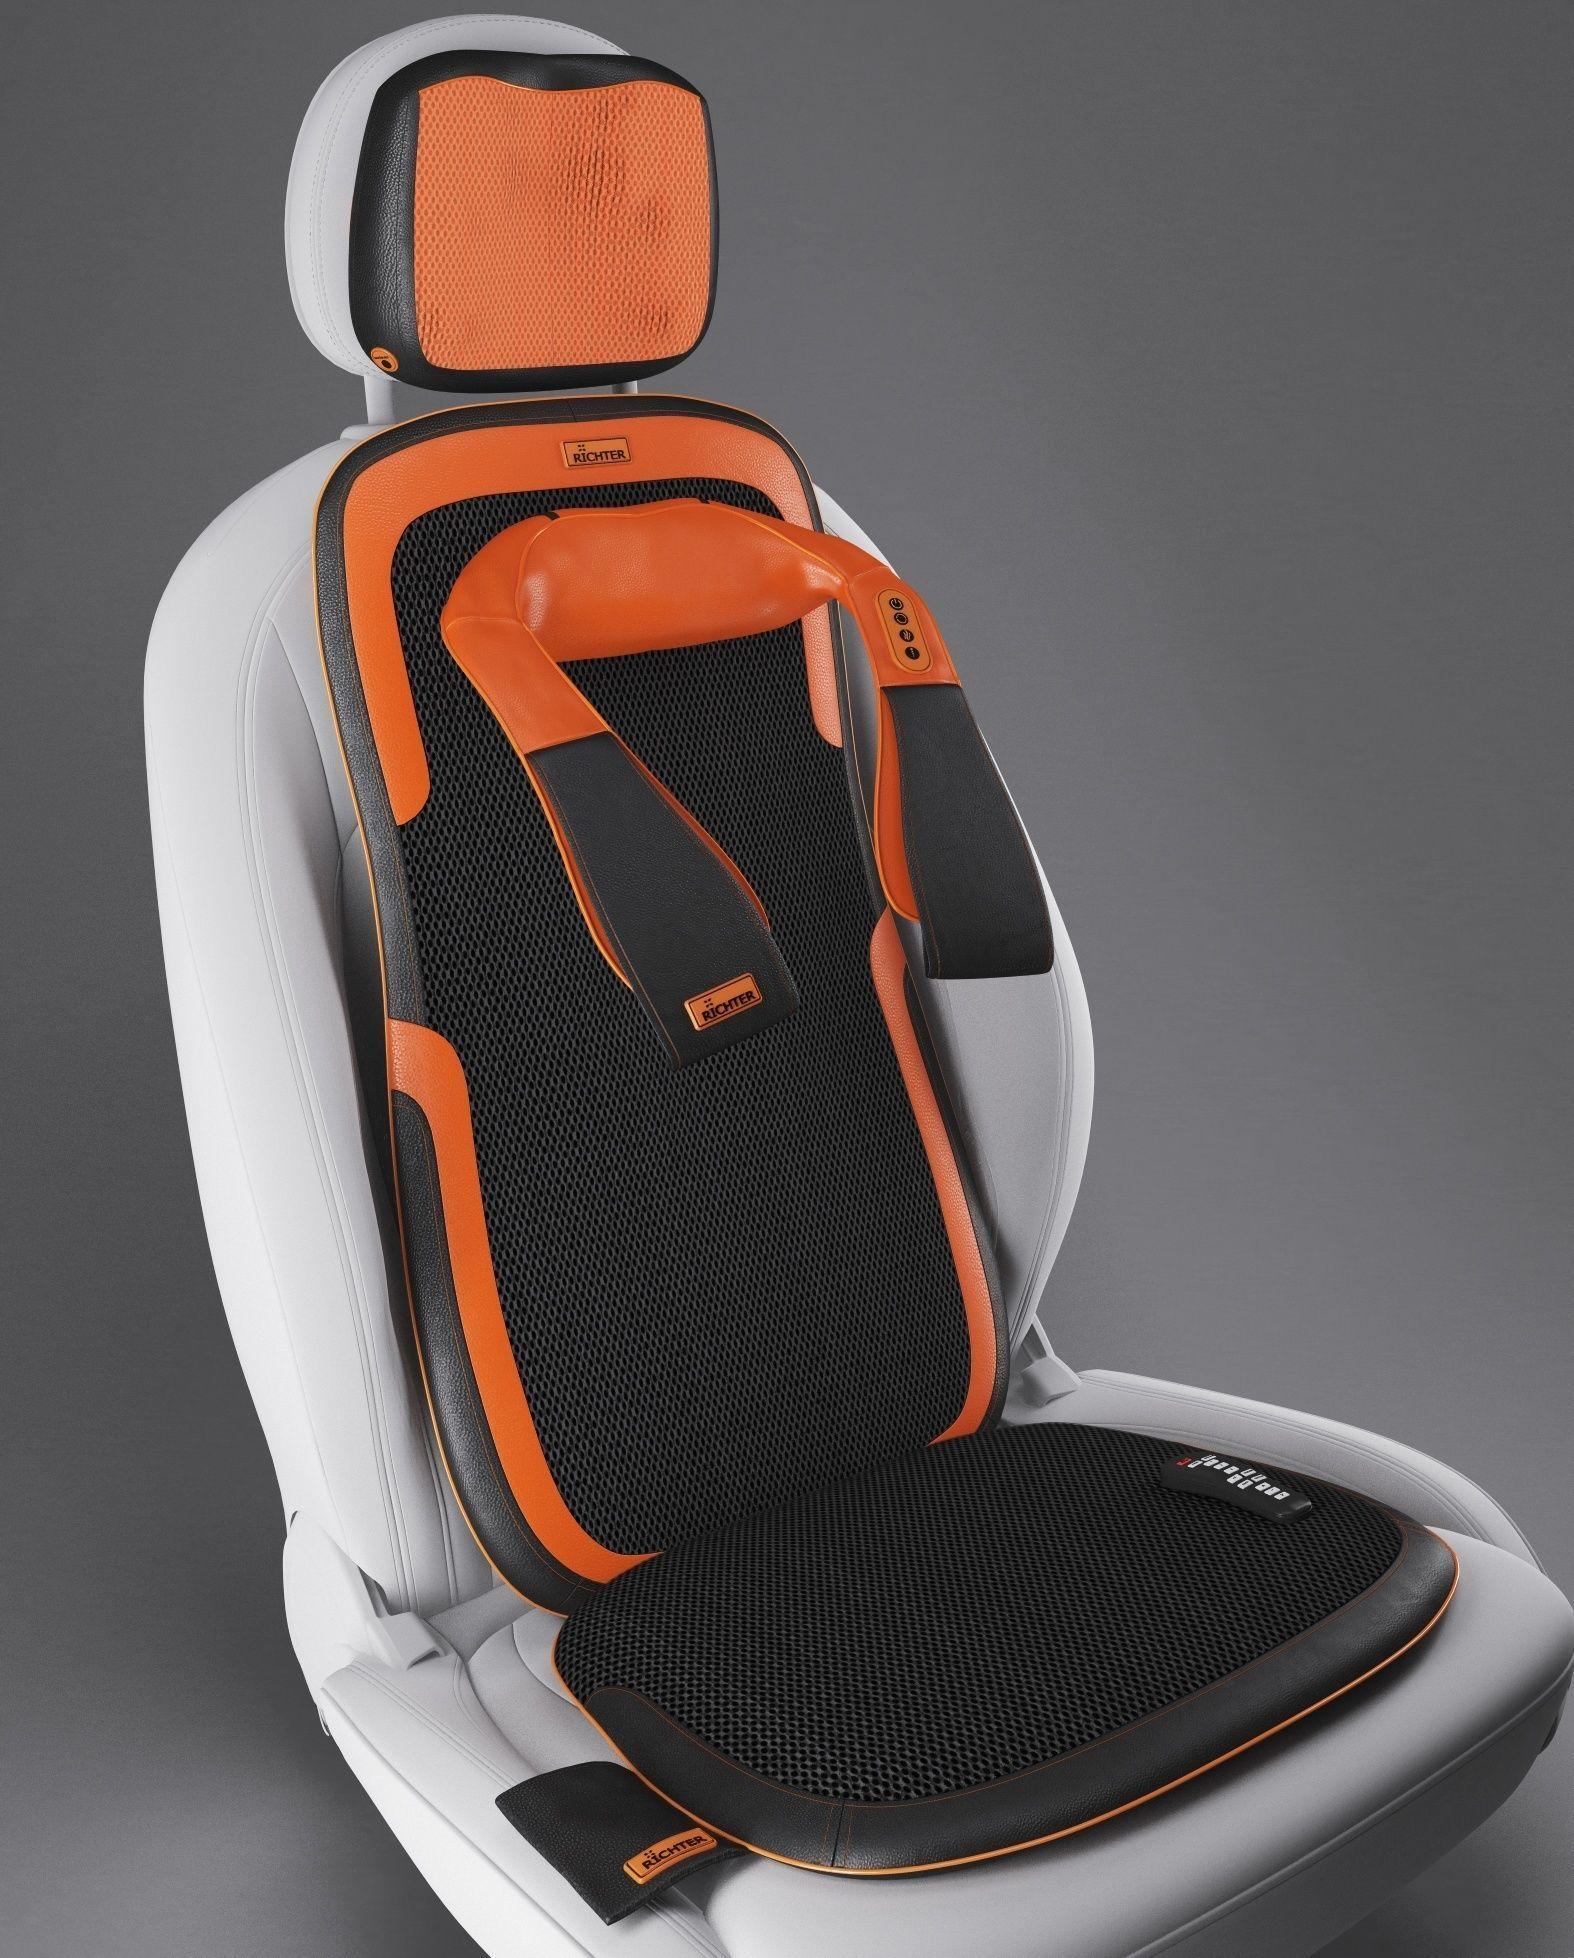 massage chair richter